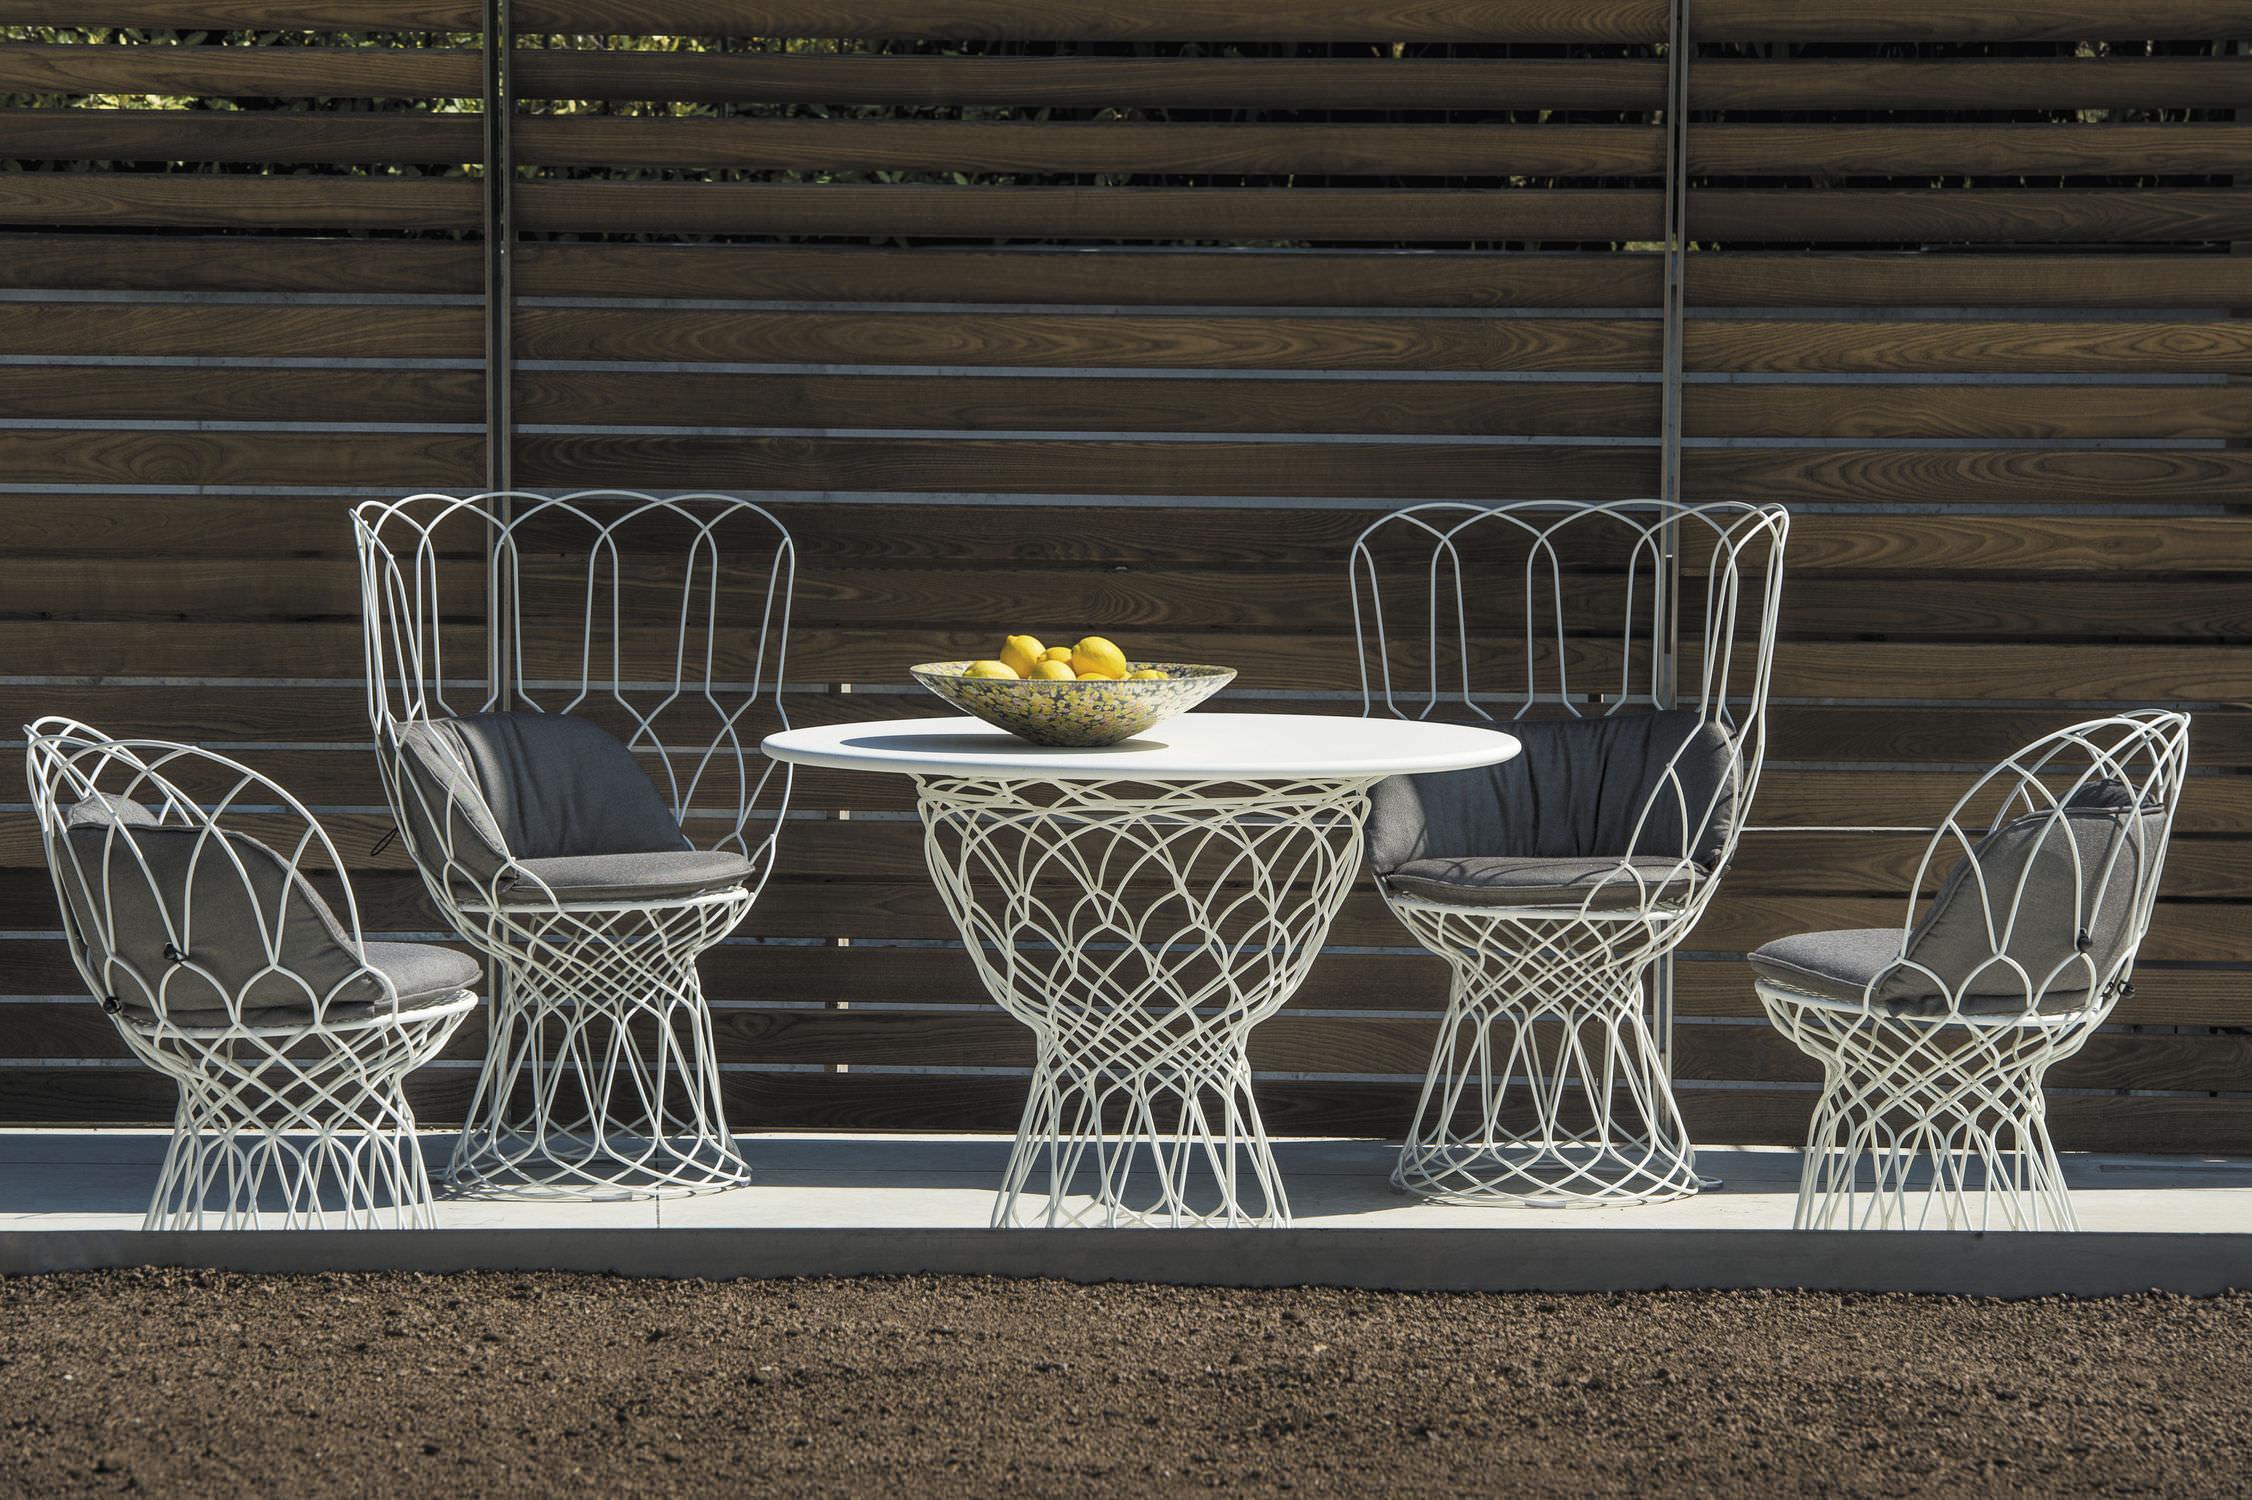 Emu Tavoli Da Giardino Prezzi.Tavolo Moderno In Acciaio Tondo Da Giardino Re Trouve Emu